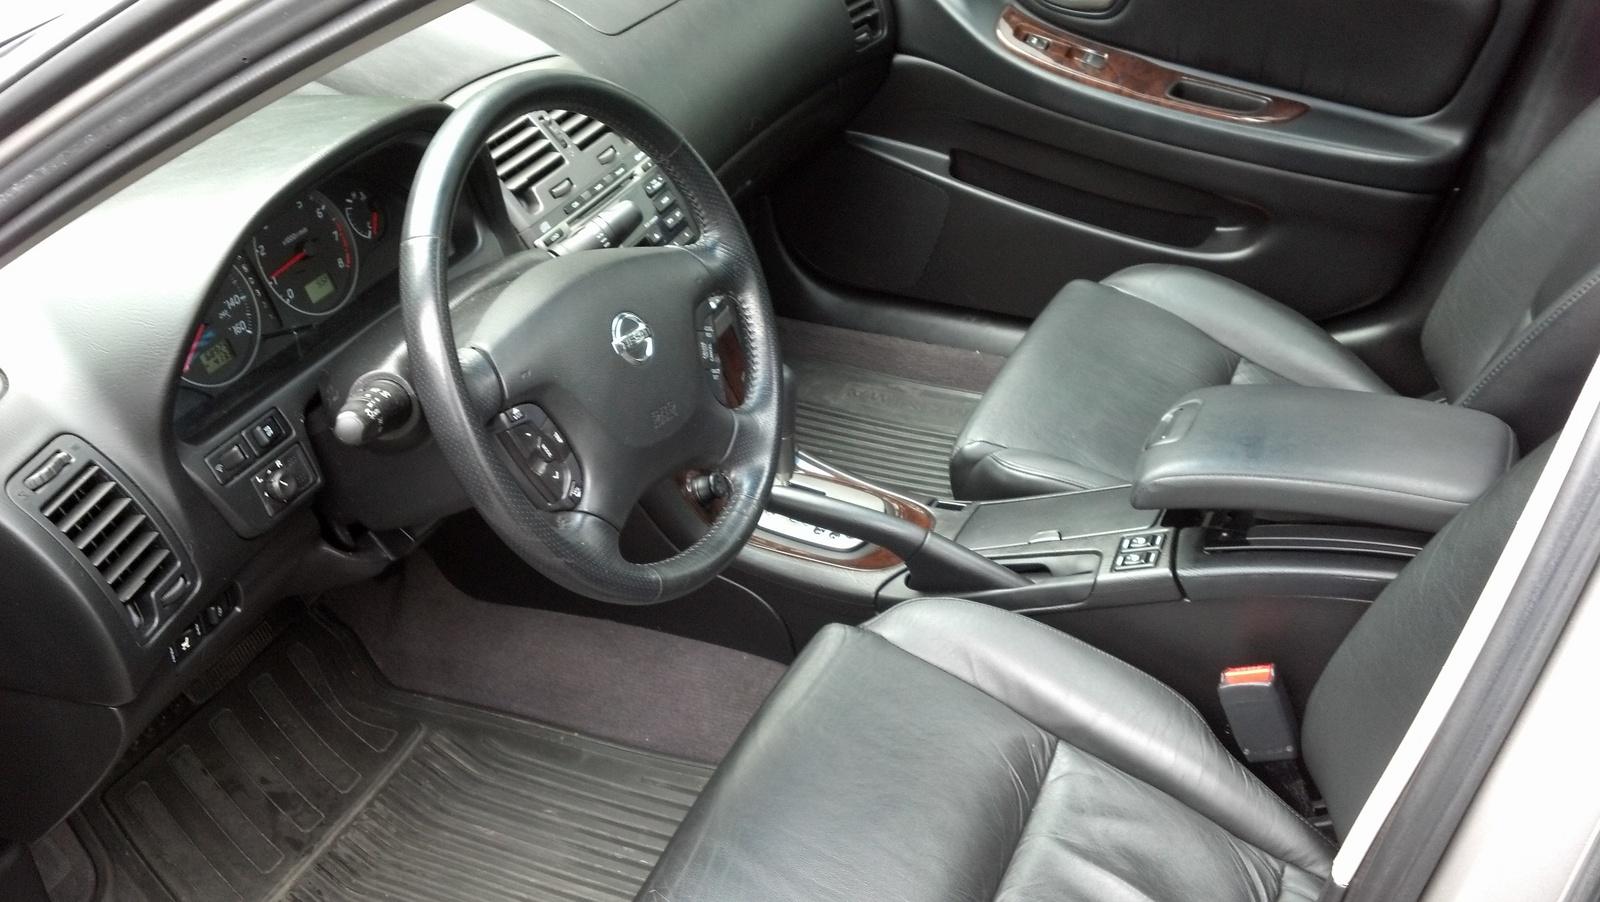 2002 Nissan Maxima Image 6